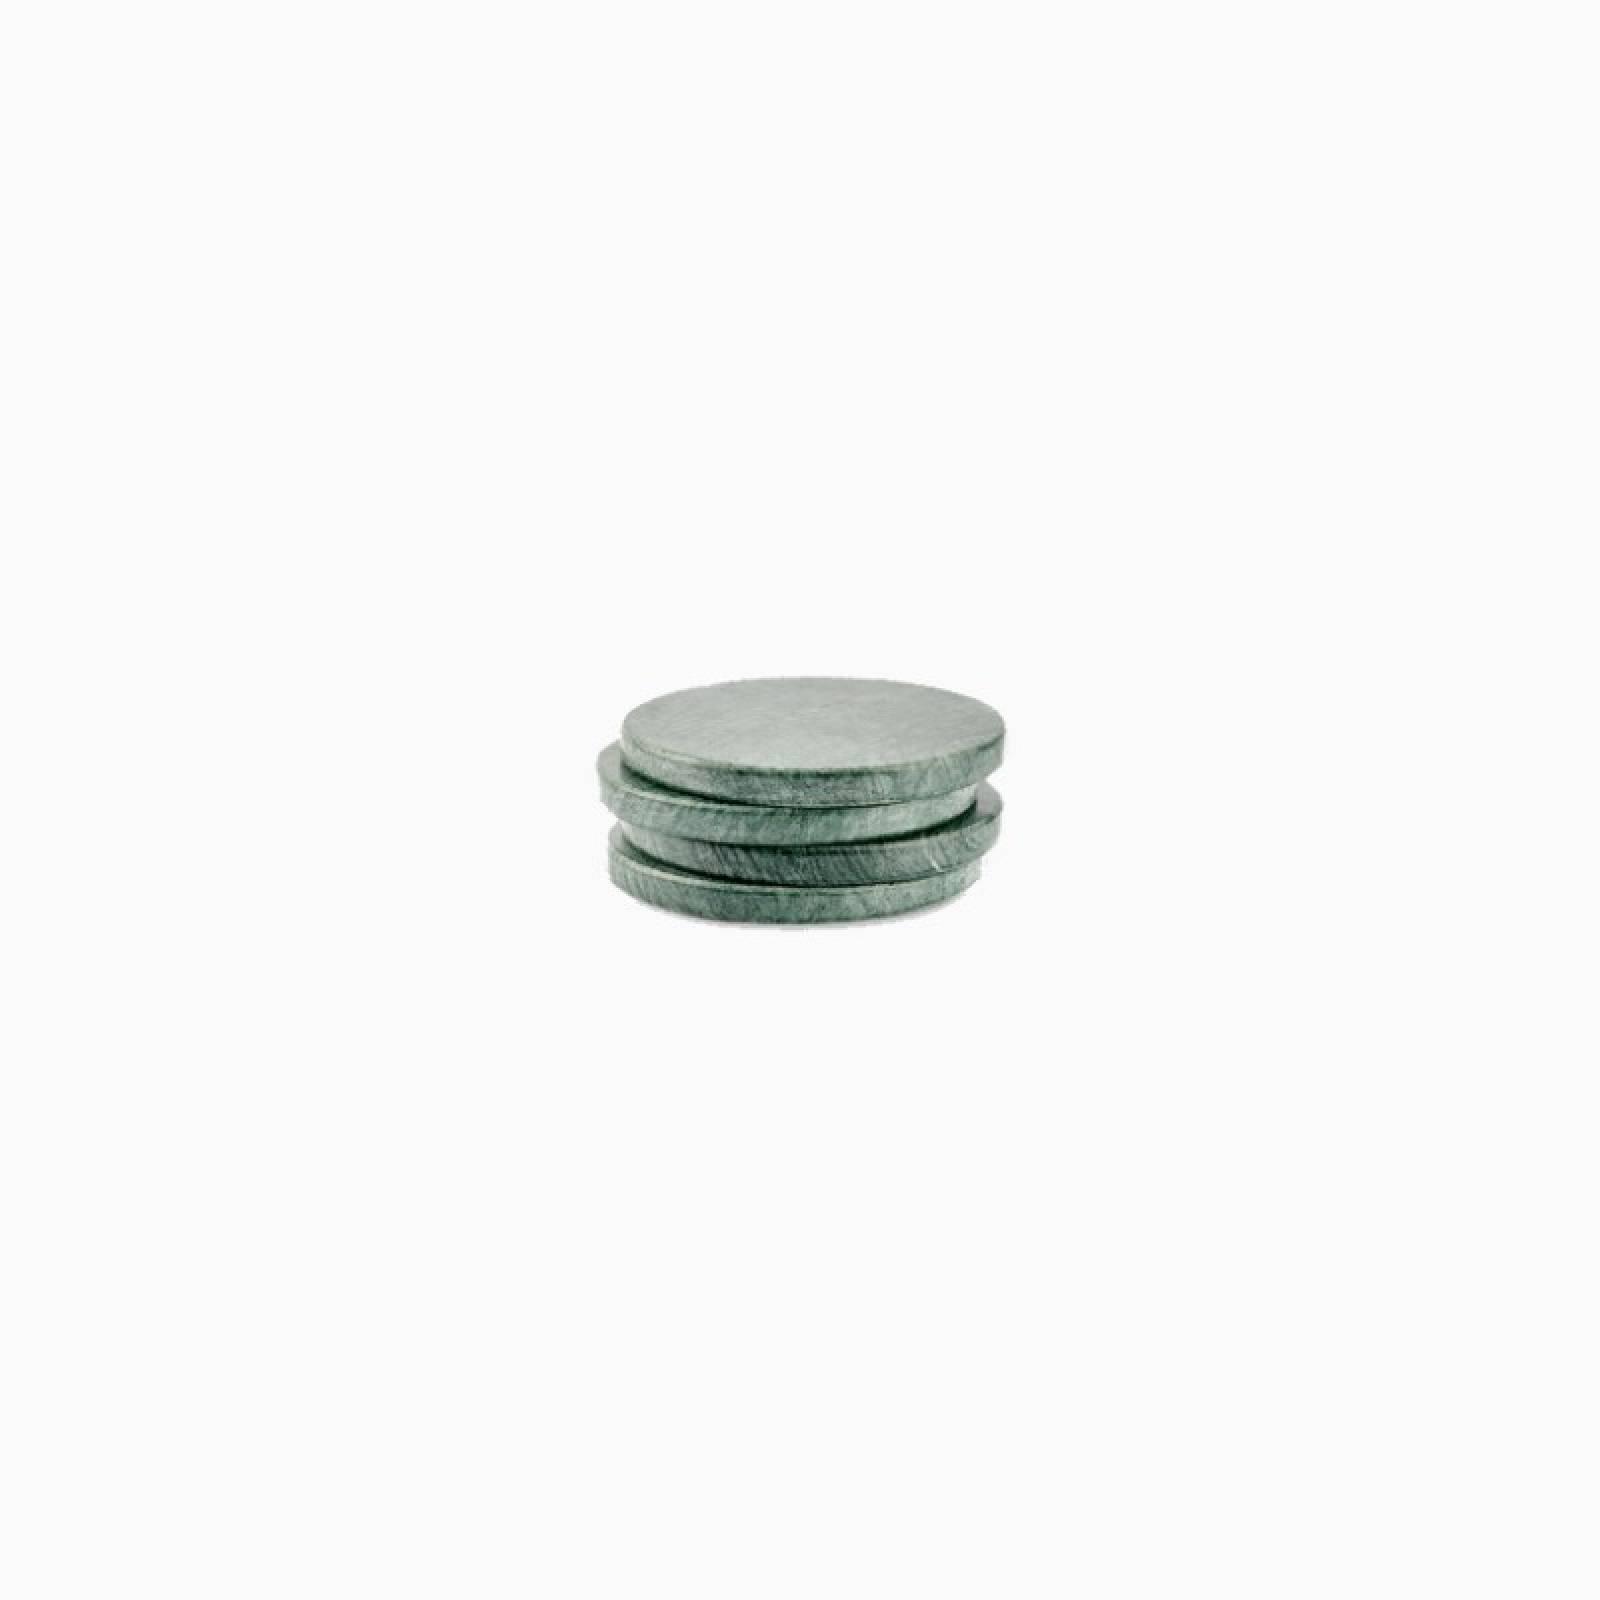 Set Of 4 Circular Solid Green Marble Coasters thumbnails